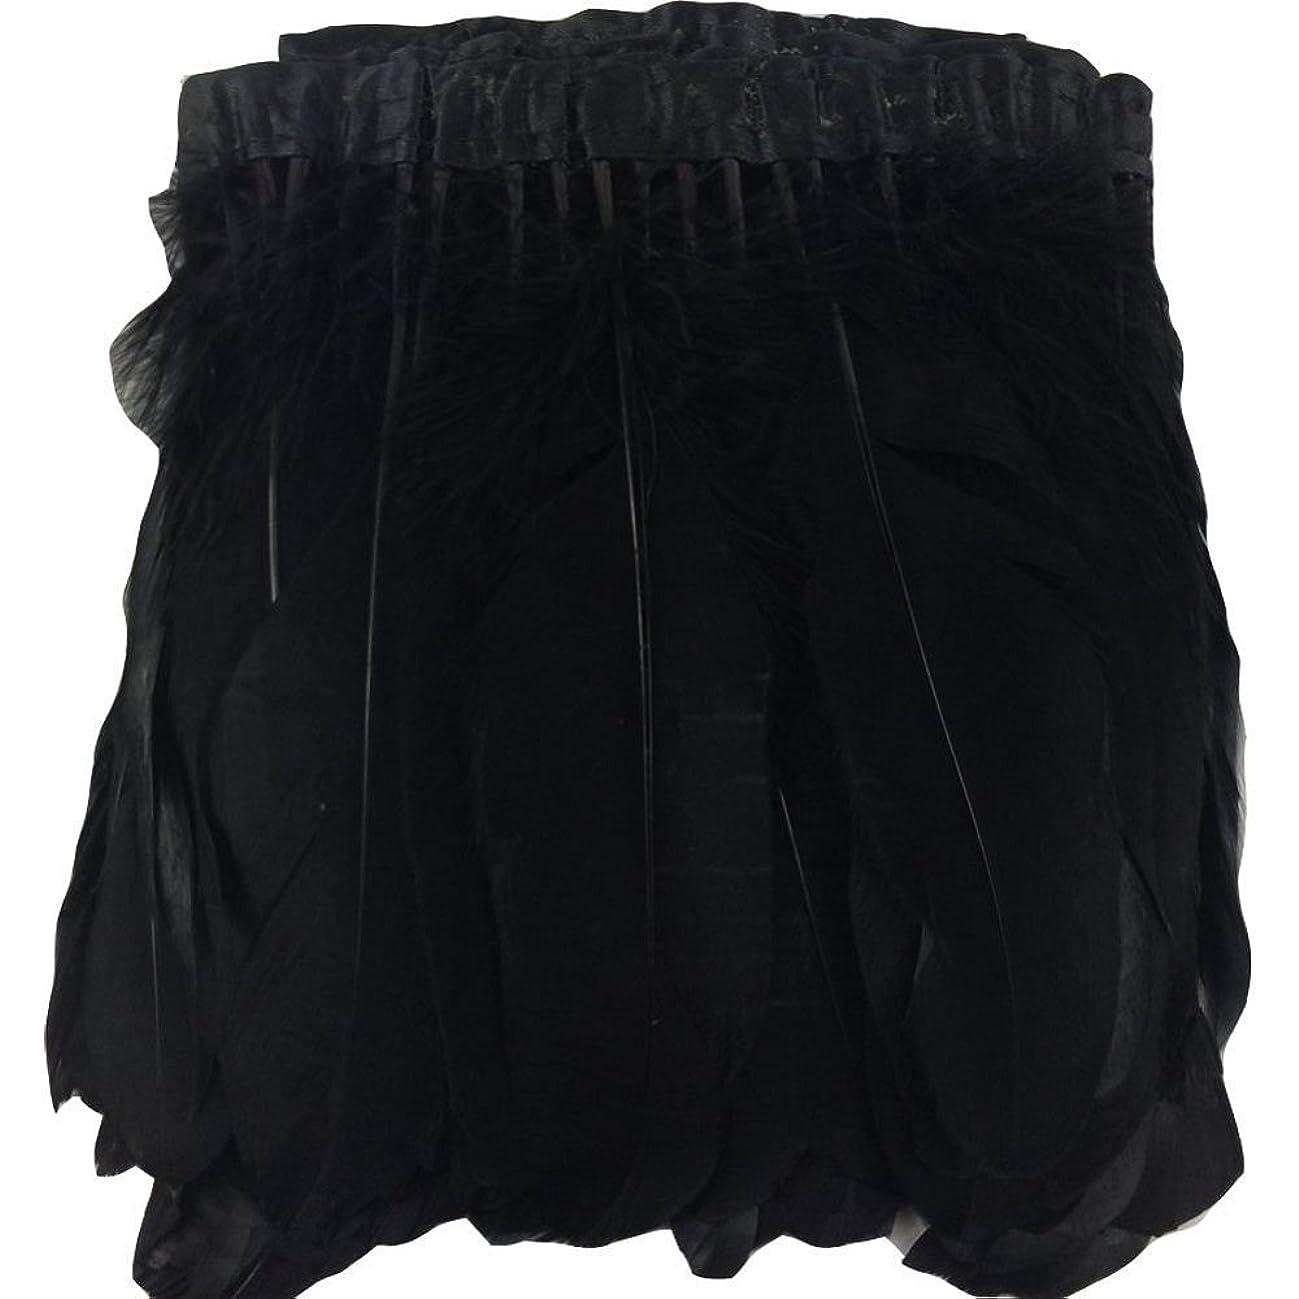 ADAMAI 2 Yards Goose Feathers Trims Fringe DIY Dress Sewing Crafts Costumes Decoration (Black)